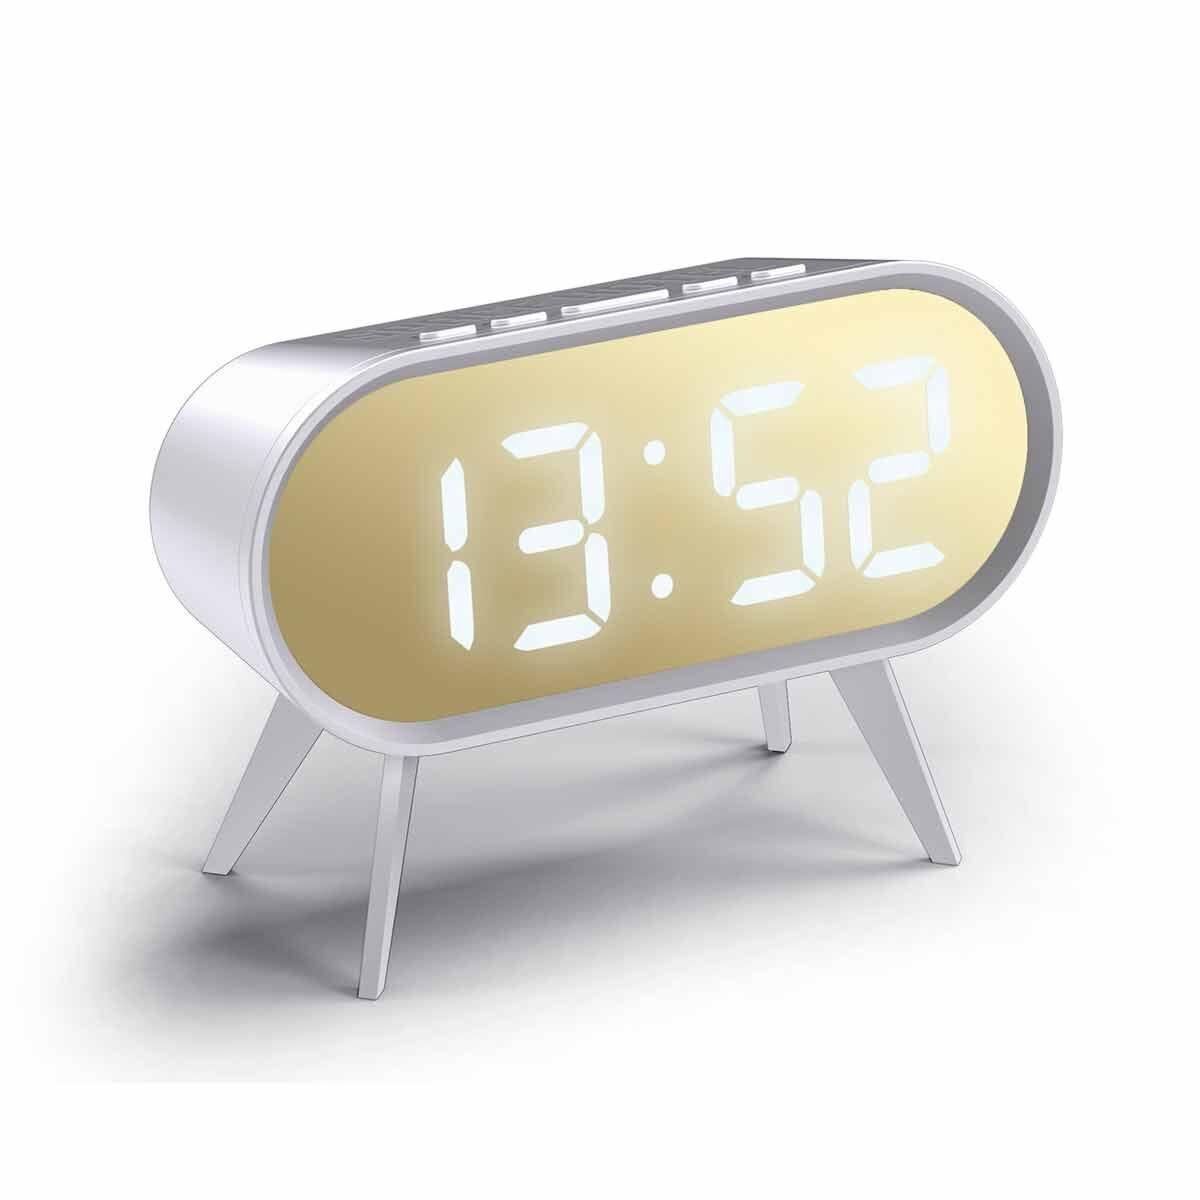 Space Hotel Digital Alarm Clock